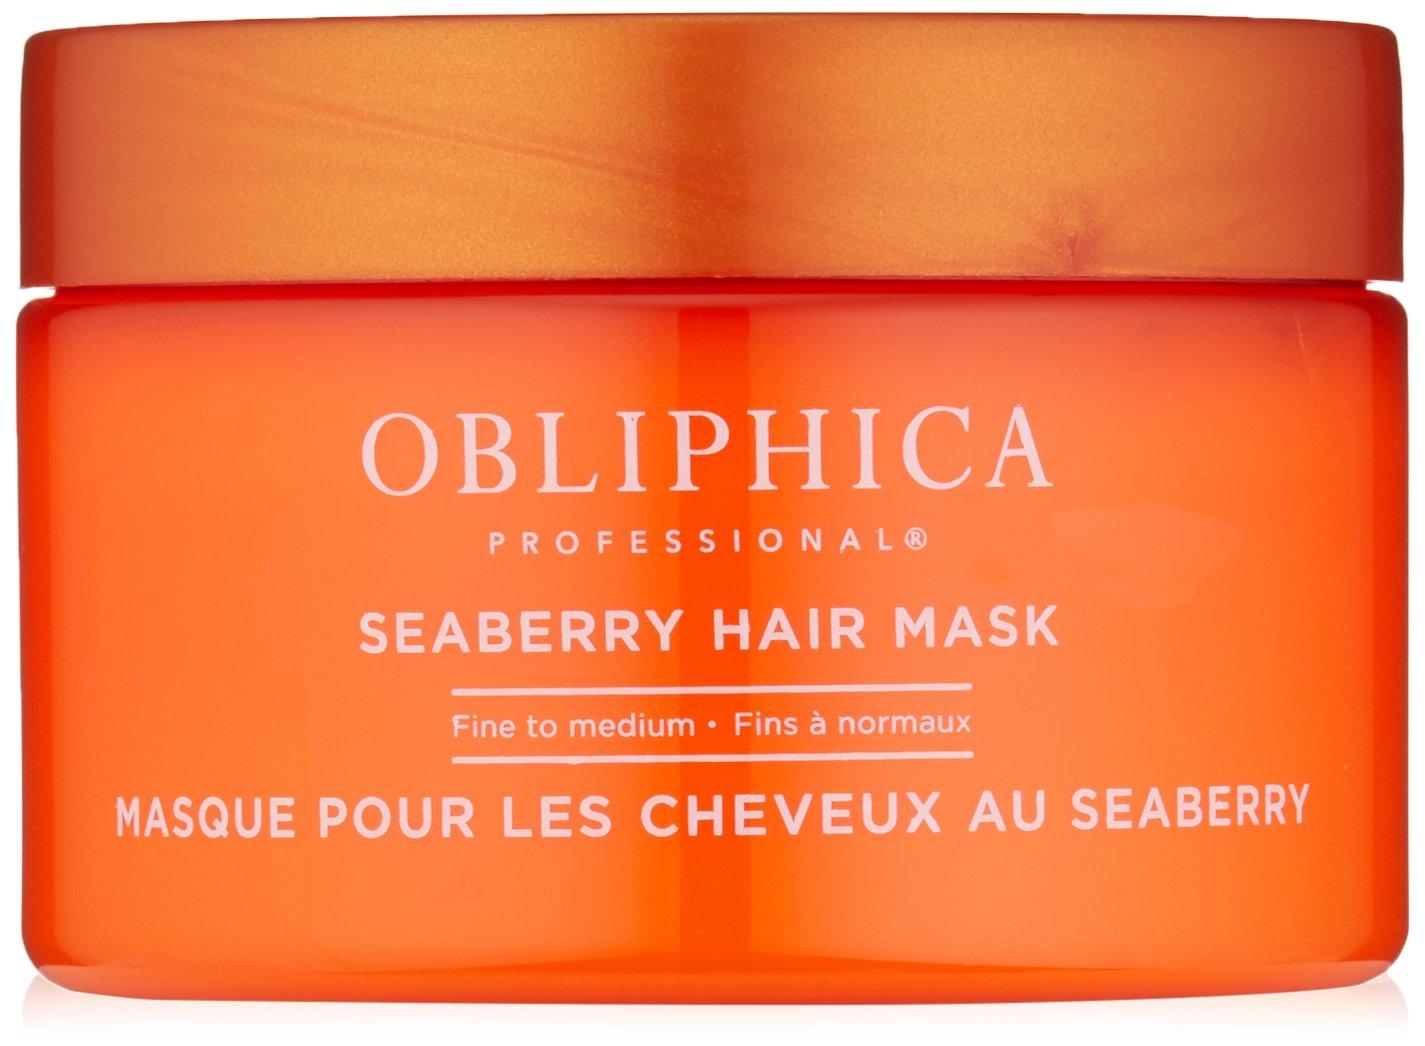 Obliphica Professional Seaberry Fine to Medium Mask, 8.5 fl. oz.